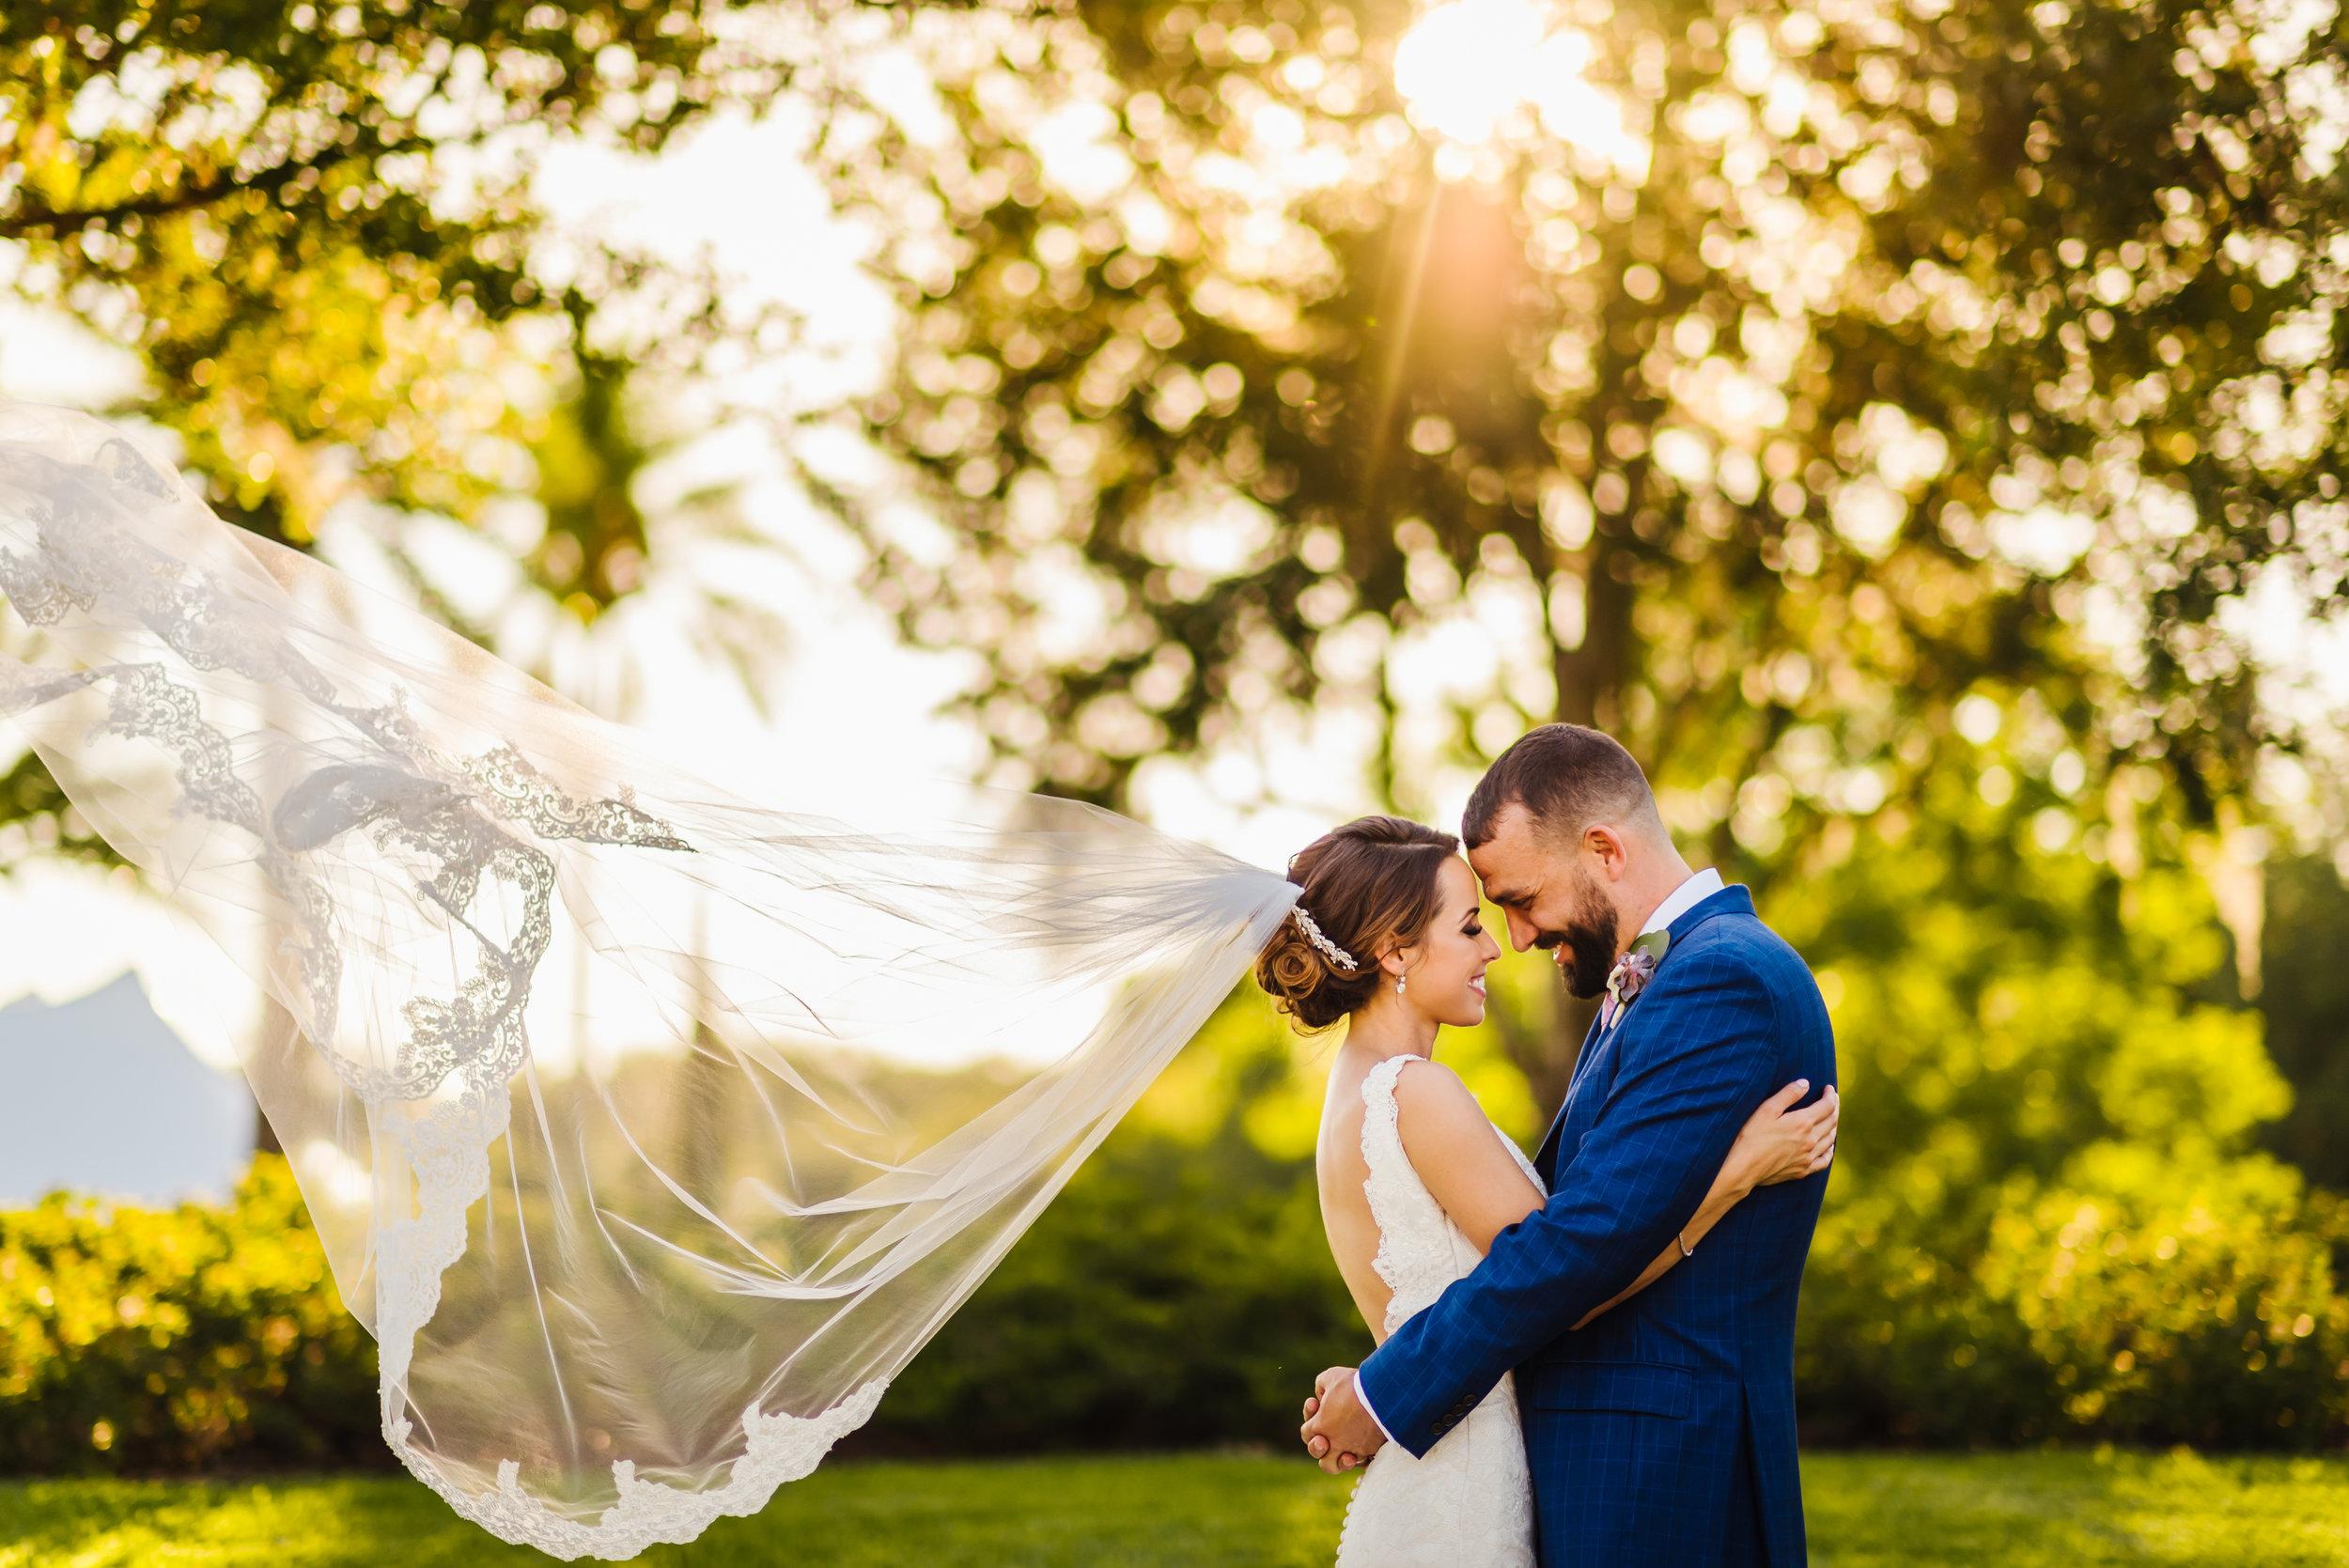 Tampa-Wedding-Photographer-Mision-Lago-Luxury-Estate-Veil-Sunset.jpg